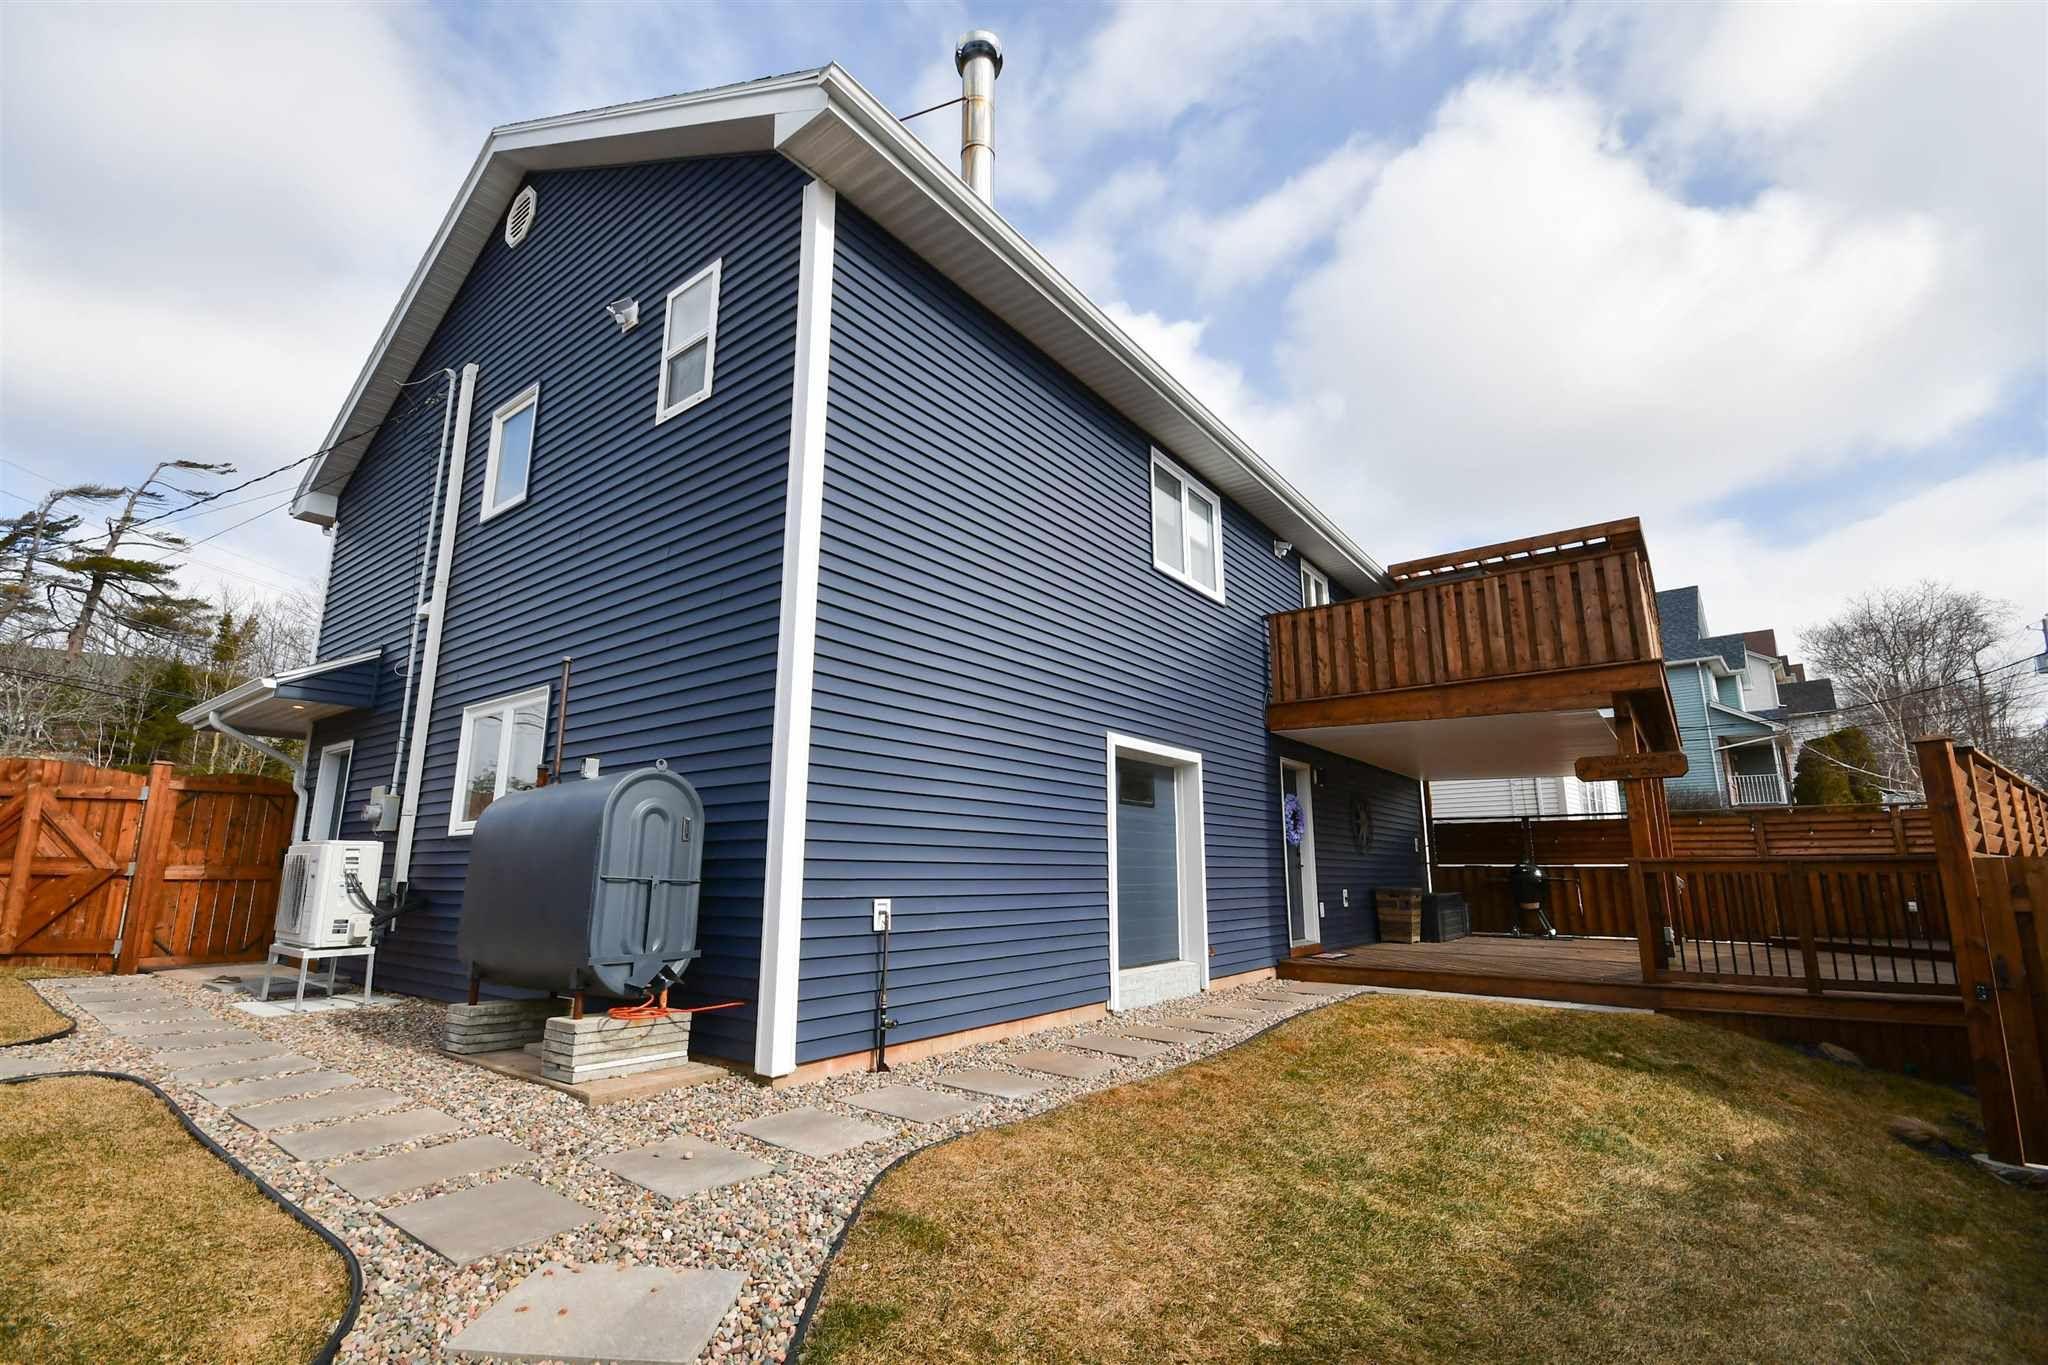 Photo 29: Photos: 17 Armstrong Court in Halifax: 5-Fairmount, Clayton Park, Rockingham Residential for sale (Halifax-Dartmouth)  : MLS®# 202105075